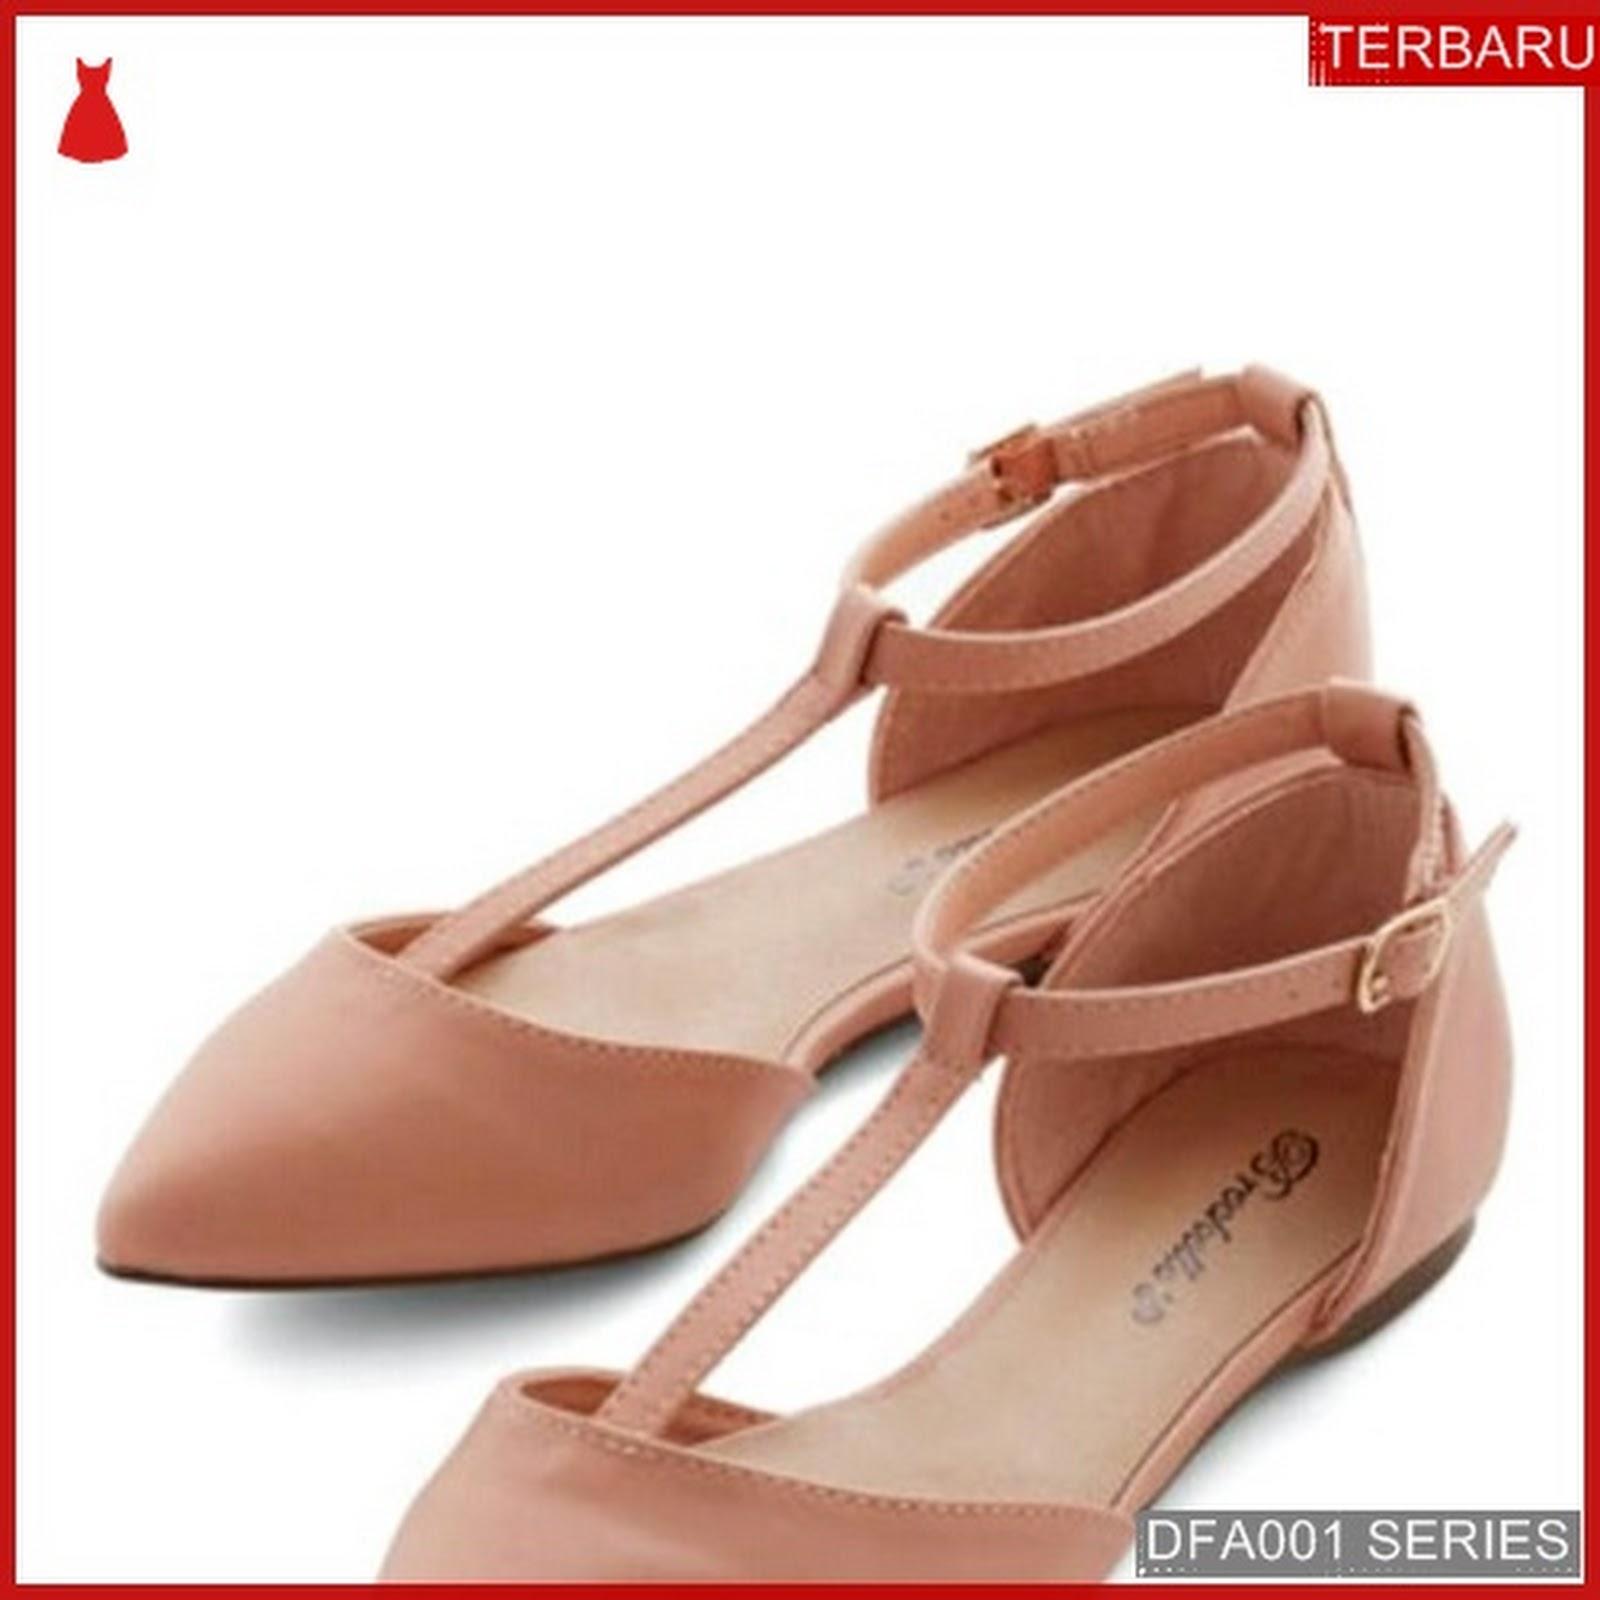 Dfa001m23 Mg09 Sepatu Flat Flatshoes Dewasa 6512 Denim Stelan Jeans Pretty